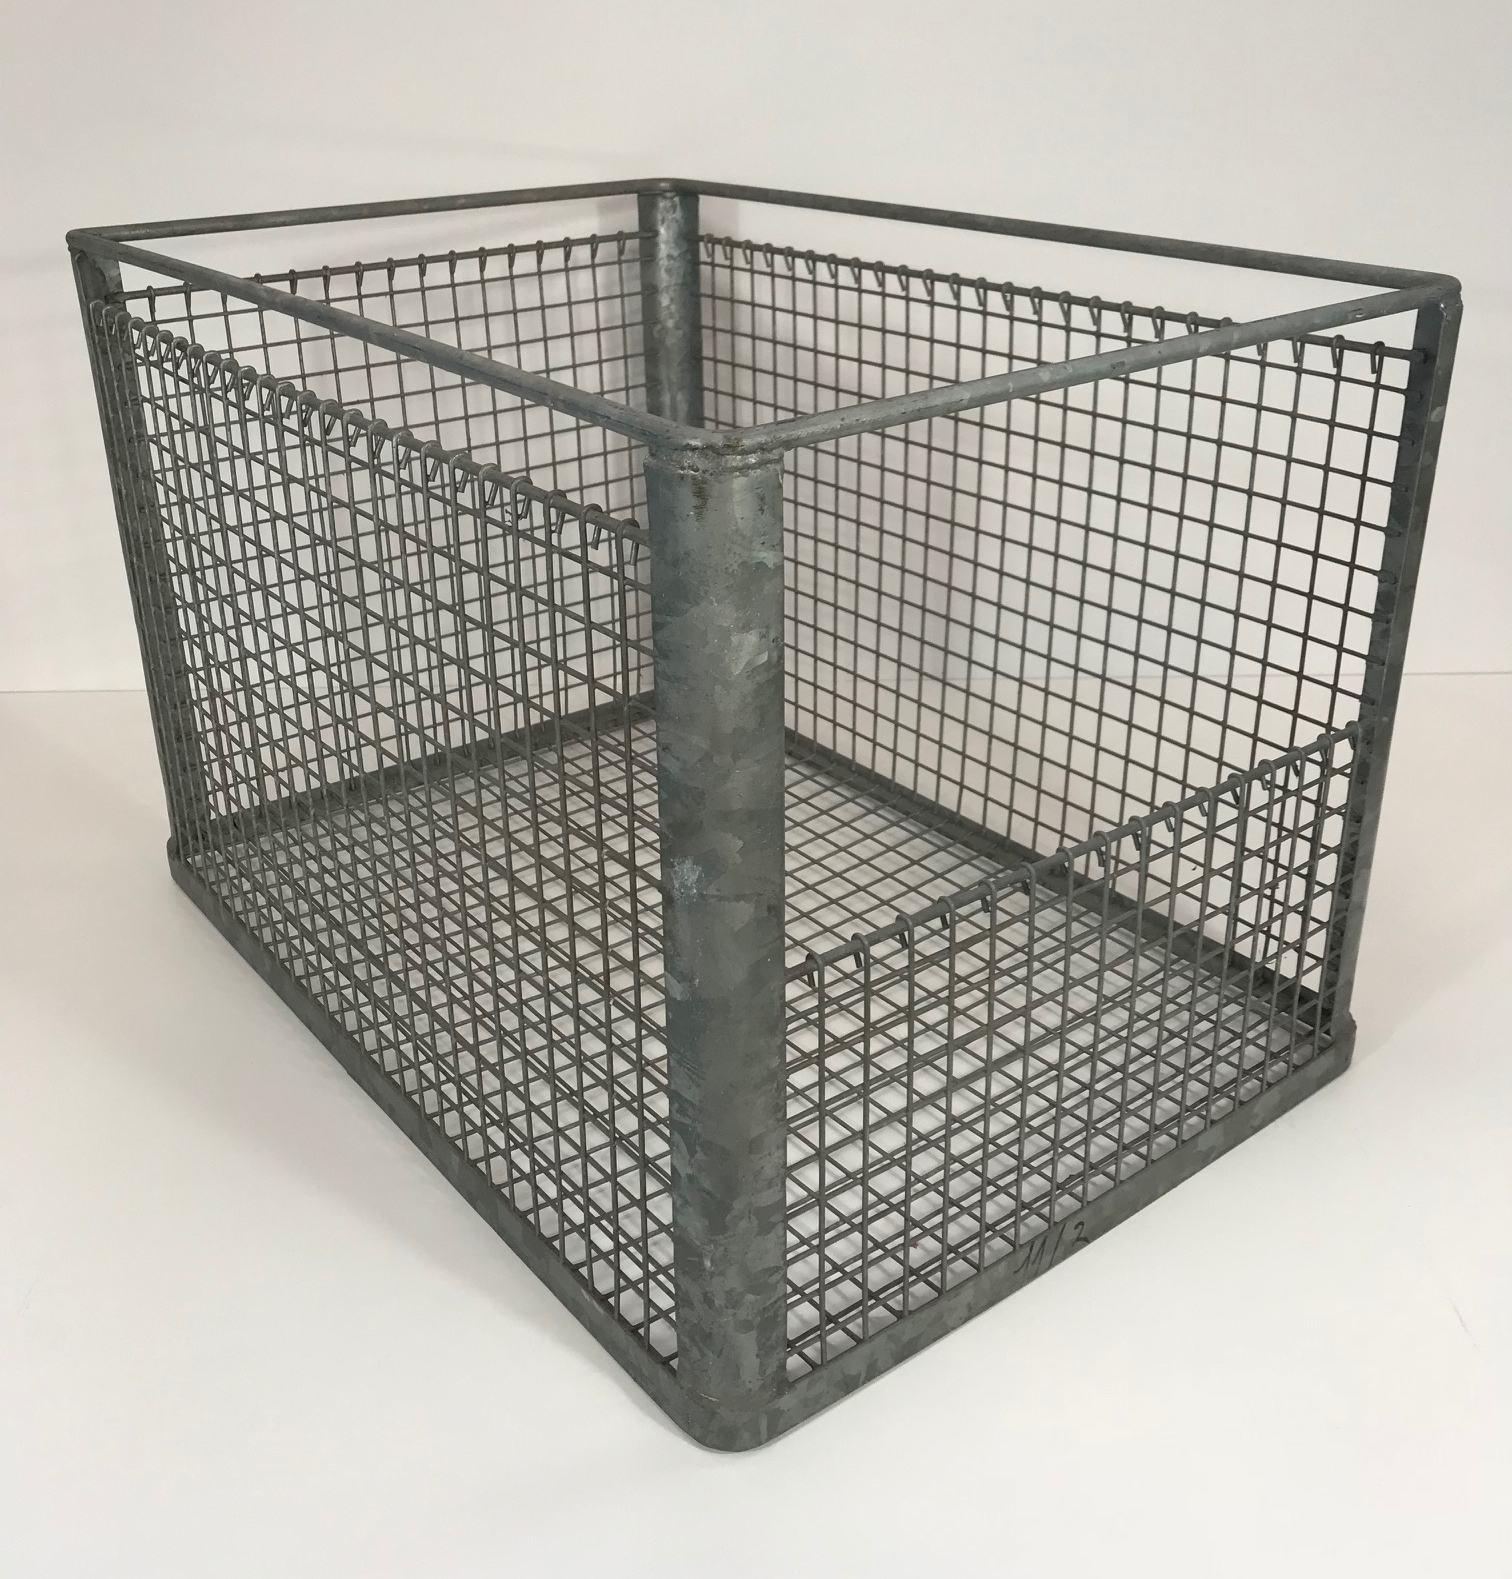 Drahtgitterkorb-80x55x54-gebraucht-5